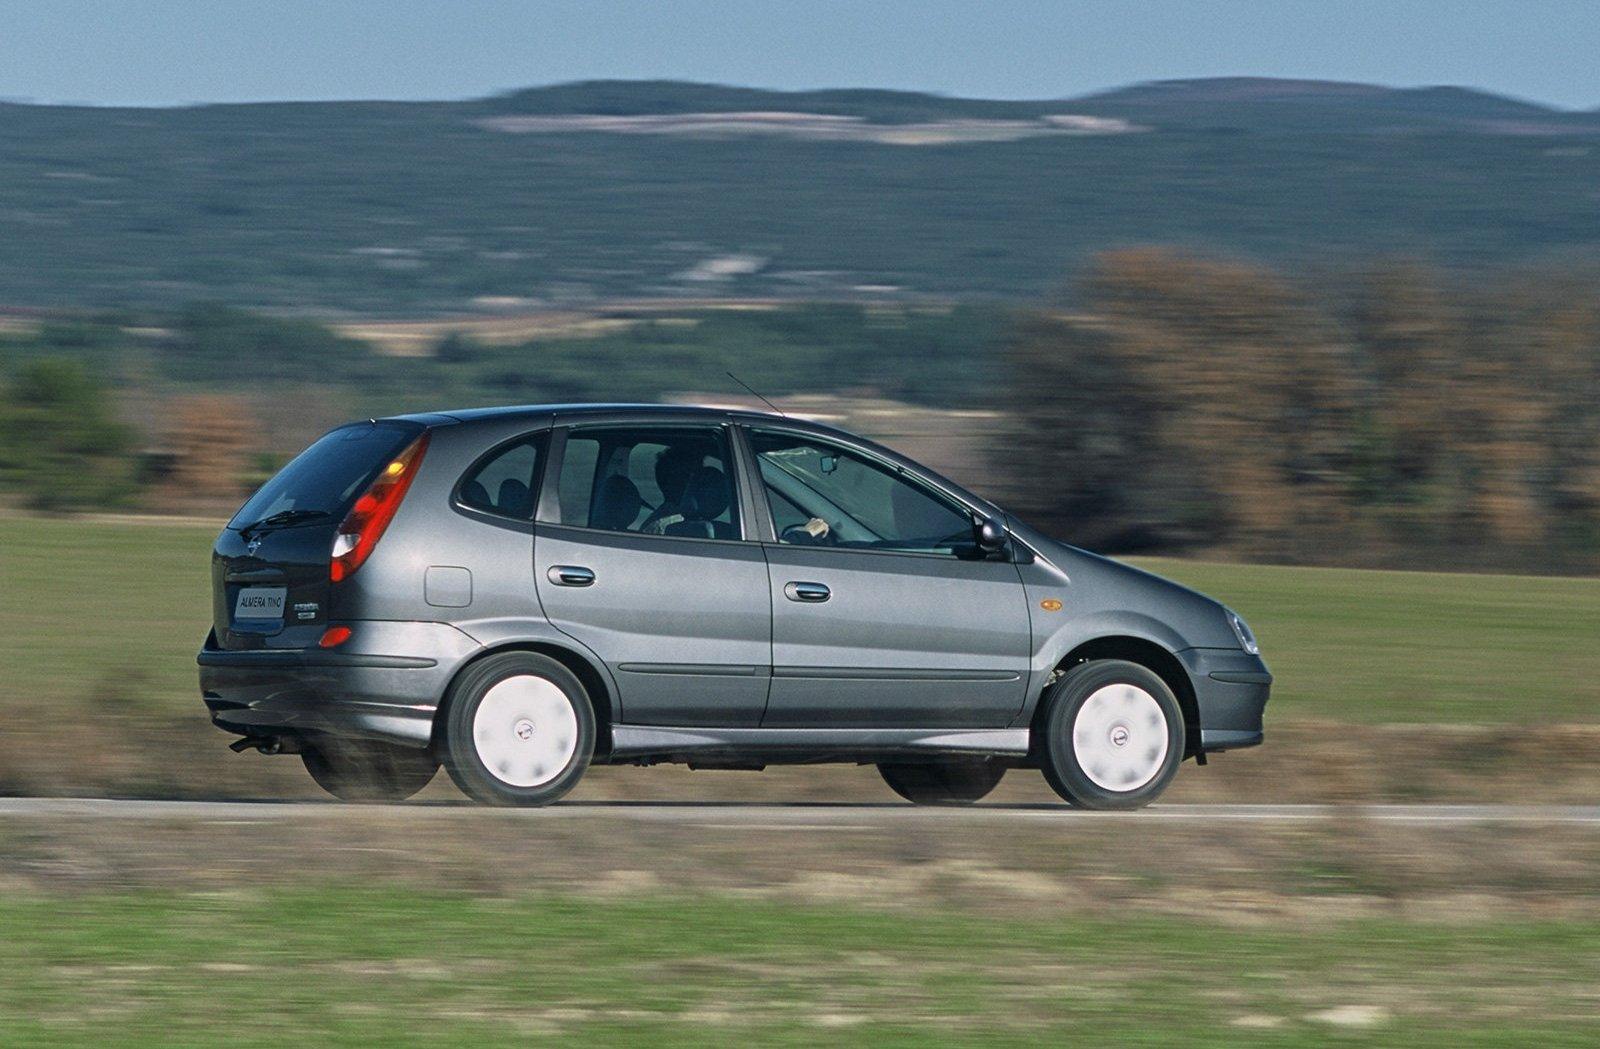 Wondrous 2000 2006 Nissan Tino Hybrid Top Speed Wiring Cloud Counpengheilarigresichrocarnosporgarnagrebsunhorelemohammedshrineorg